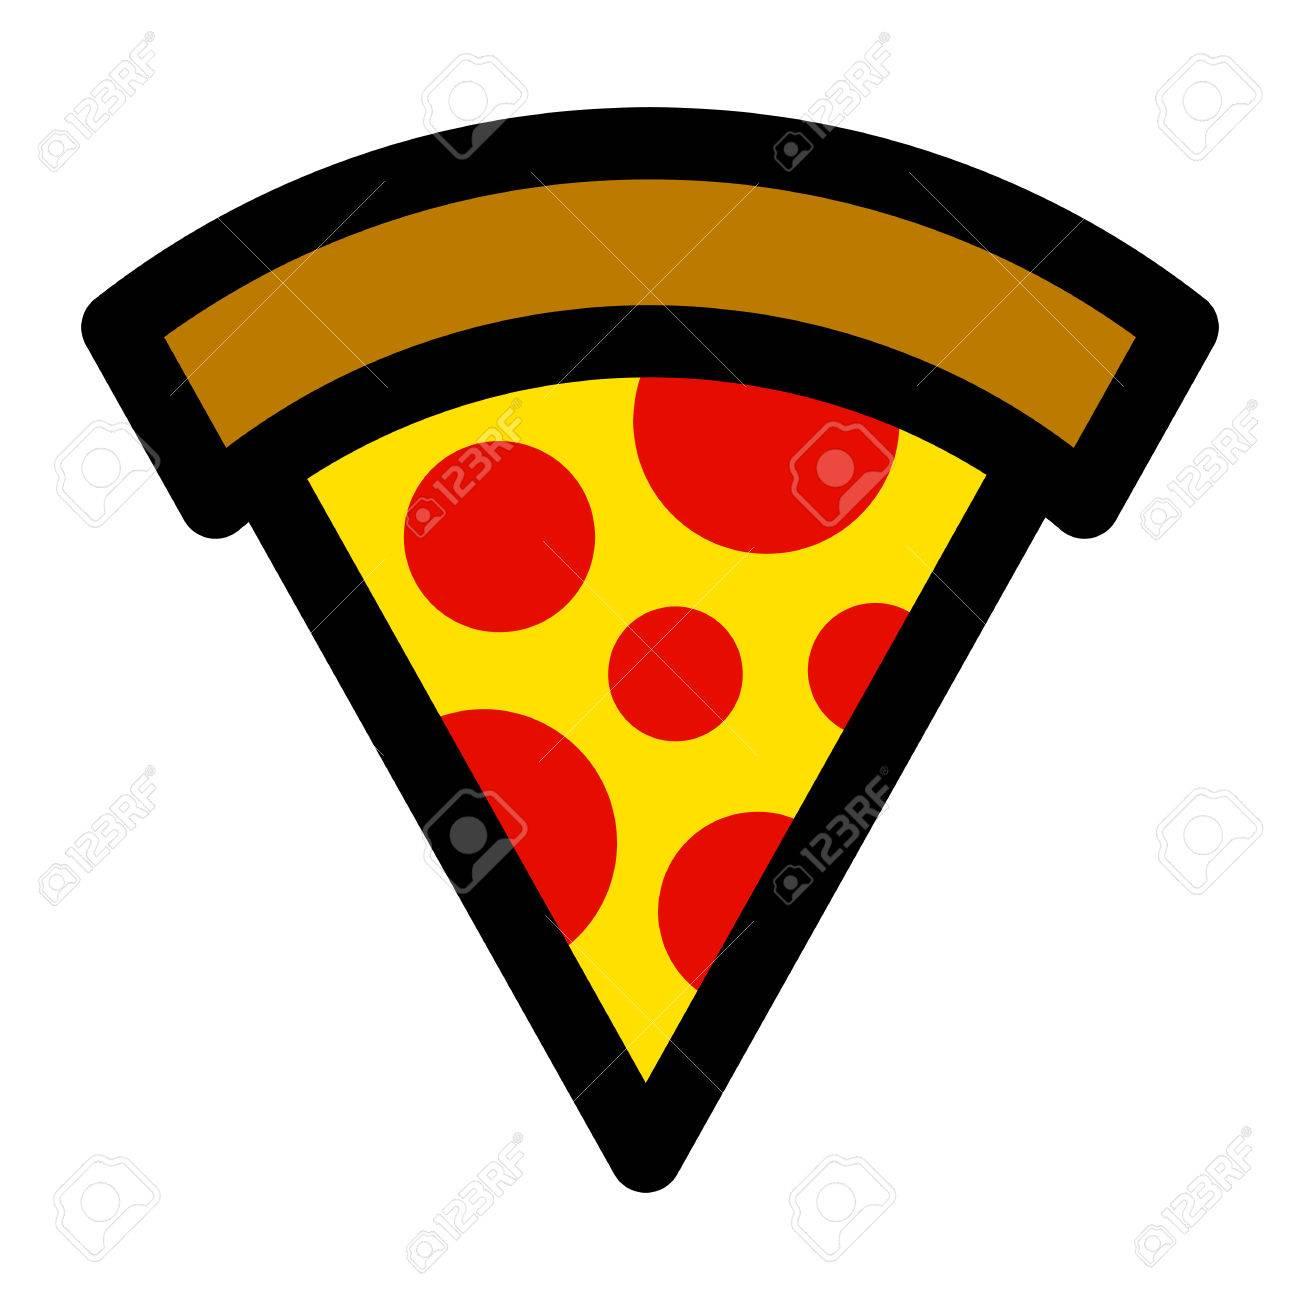 pizza slice vector icon royalty free cliparts vectors and stock rh 123rf com pizza slice vector outline pizza slice vector outline